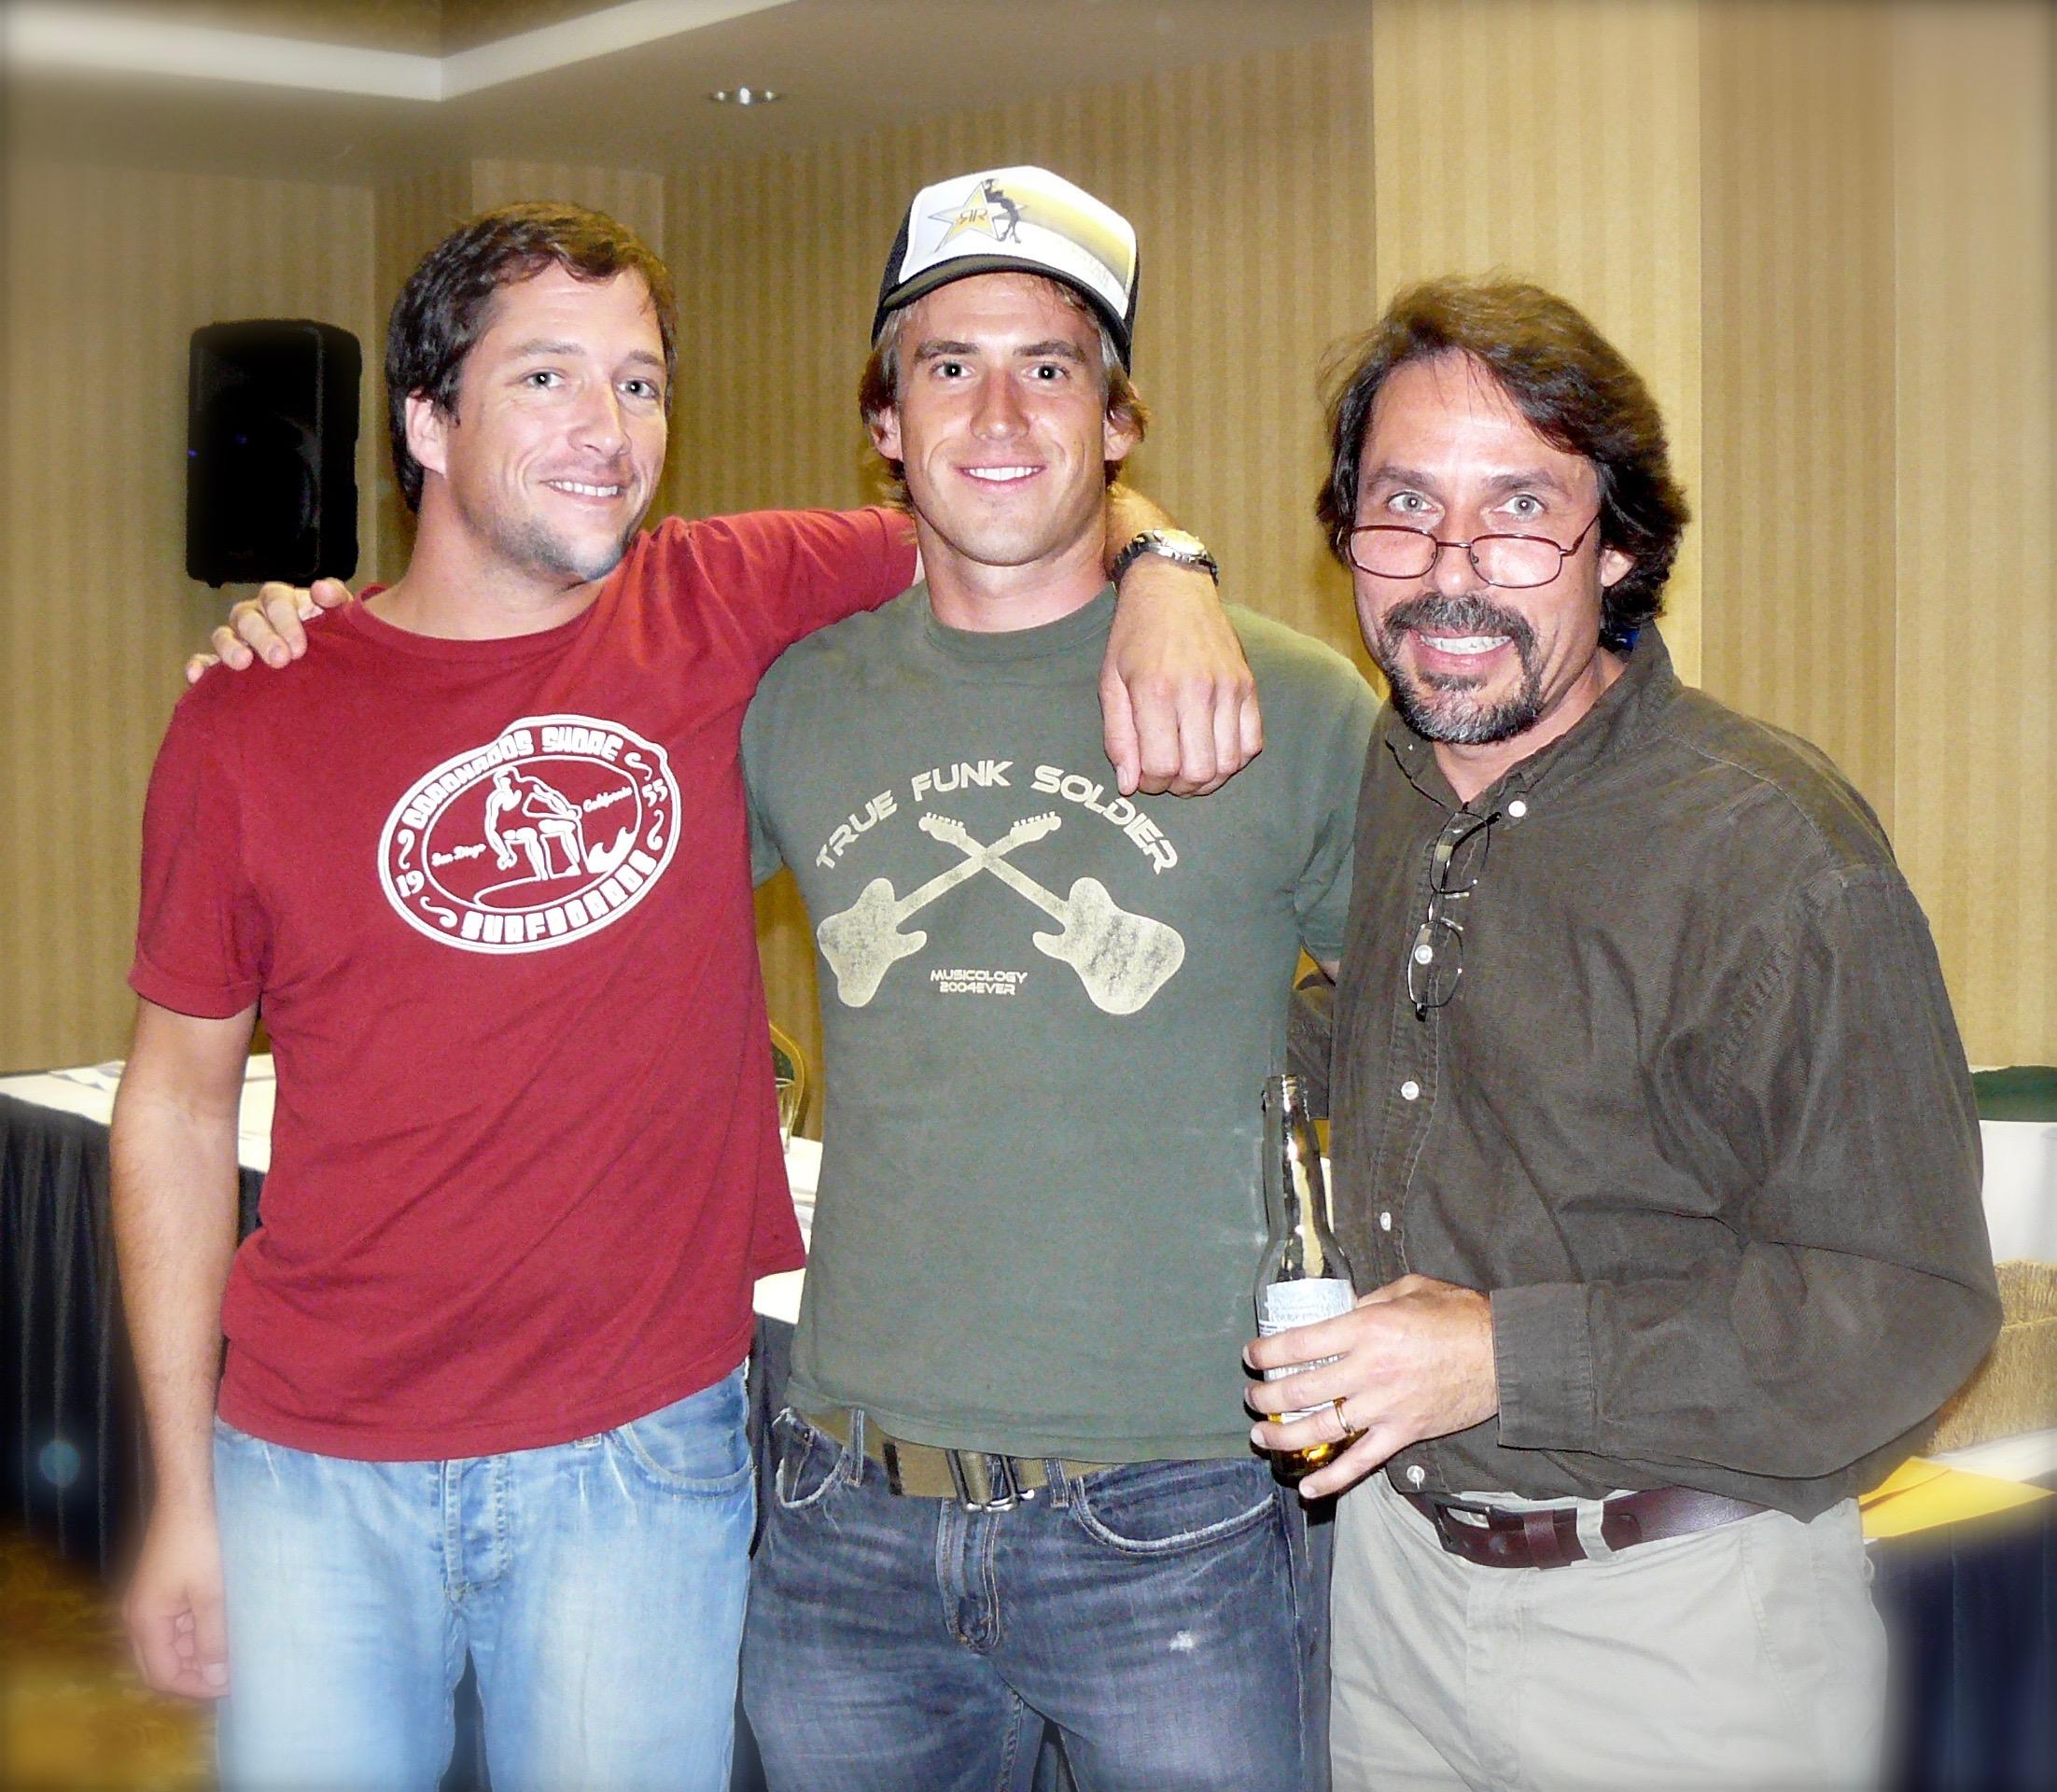 Kirk Cumming, Ryan Hiller and Mark Charles Hattersley